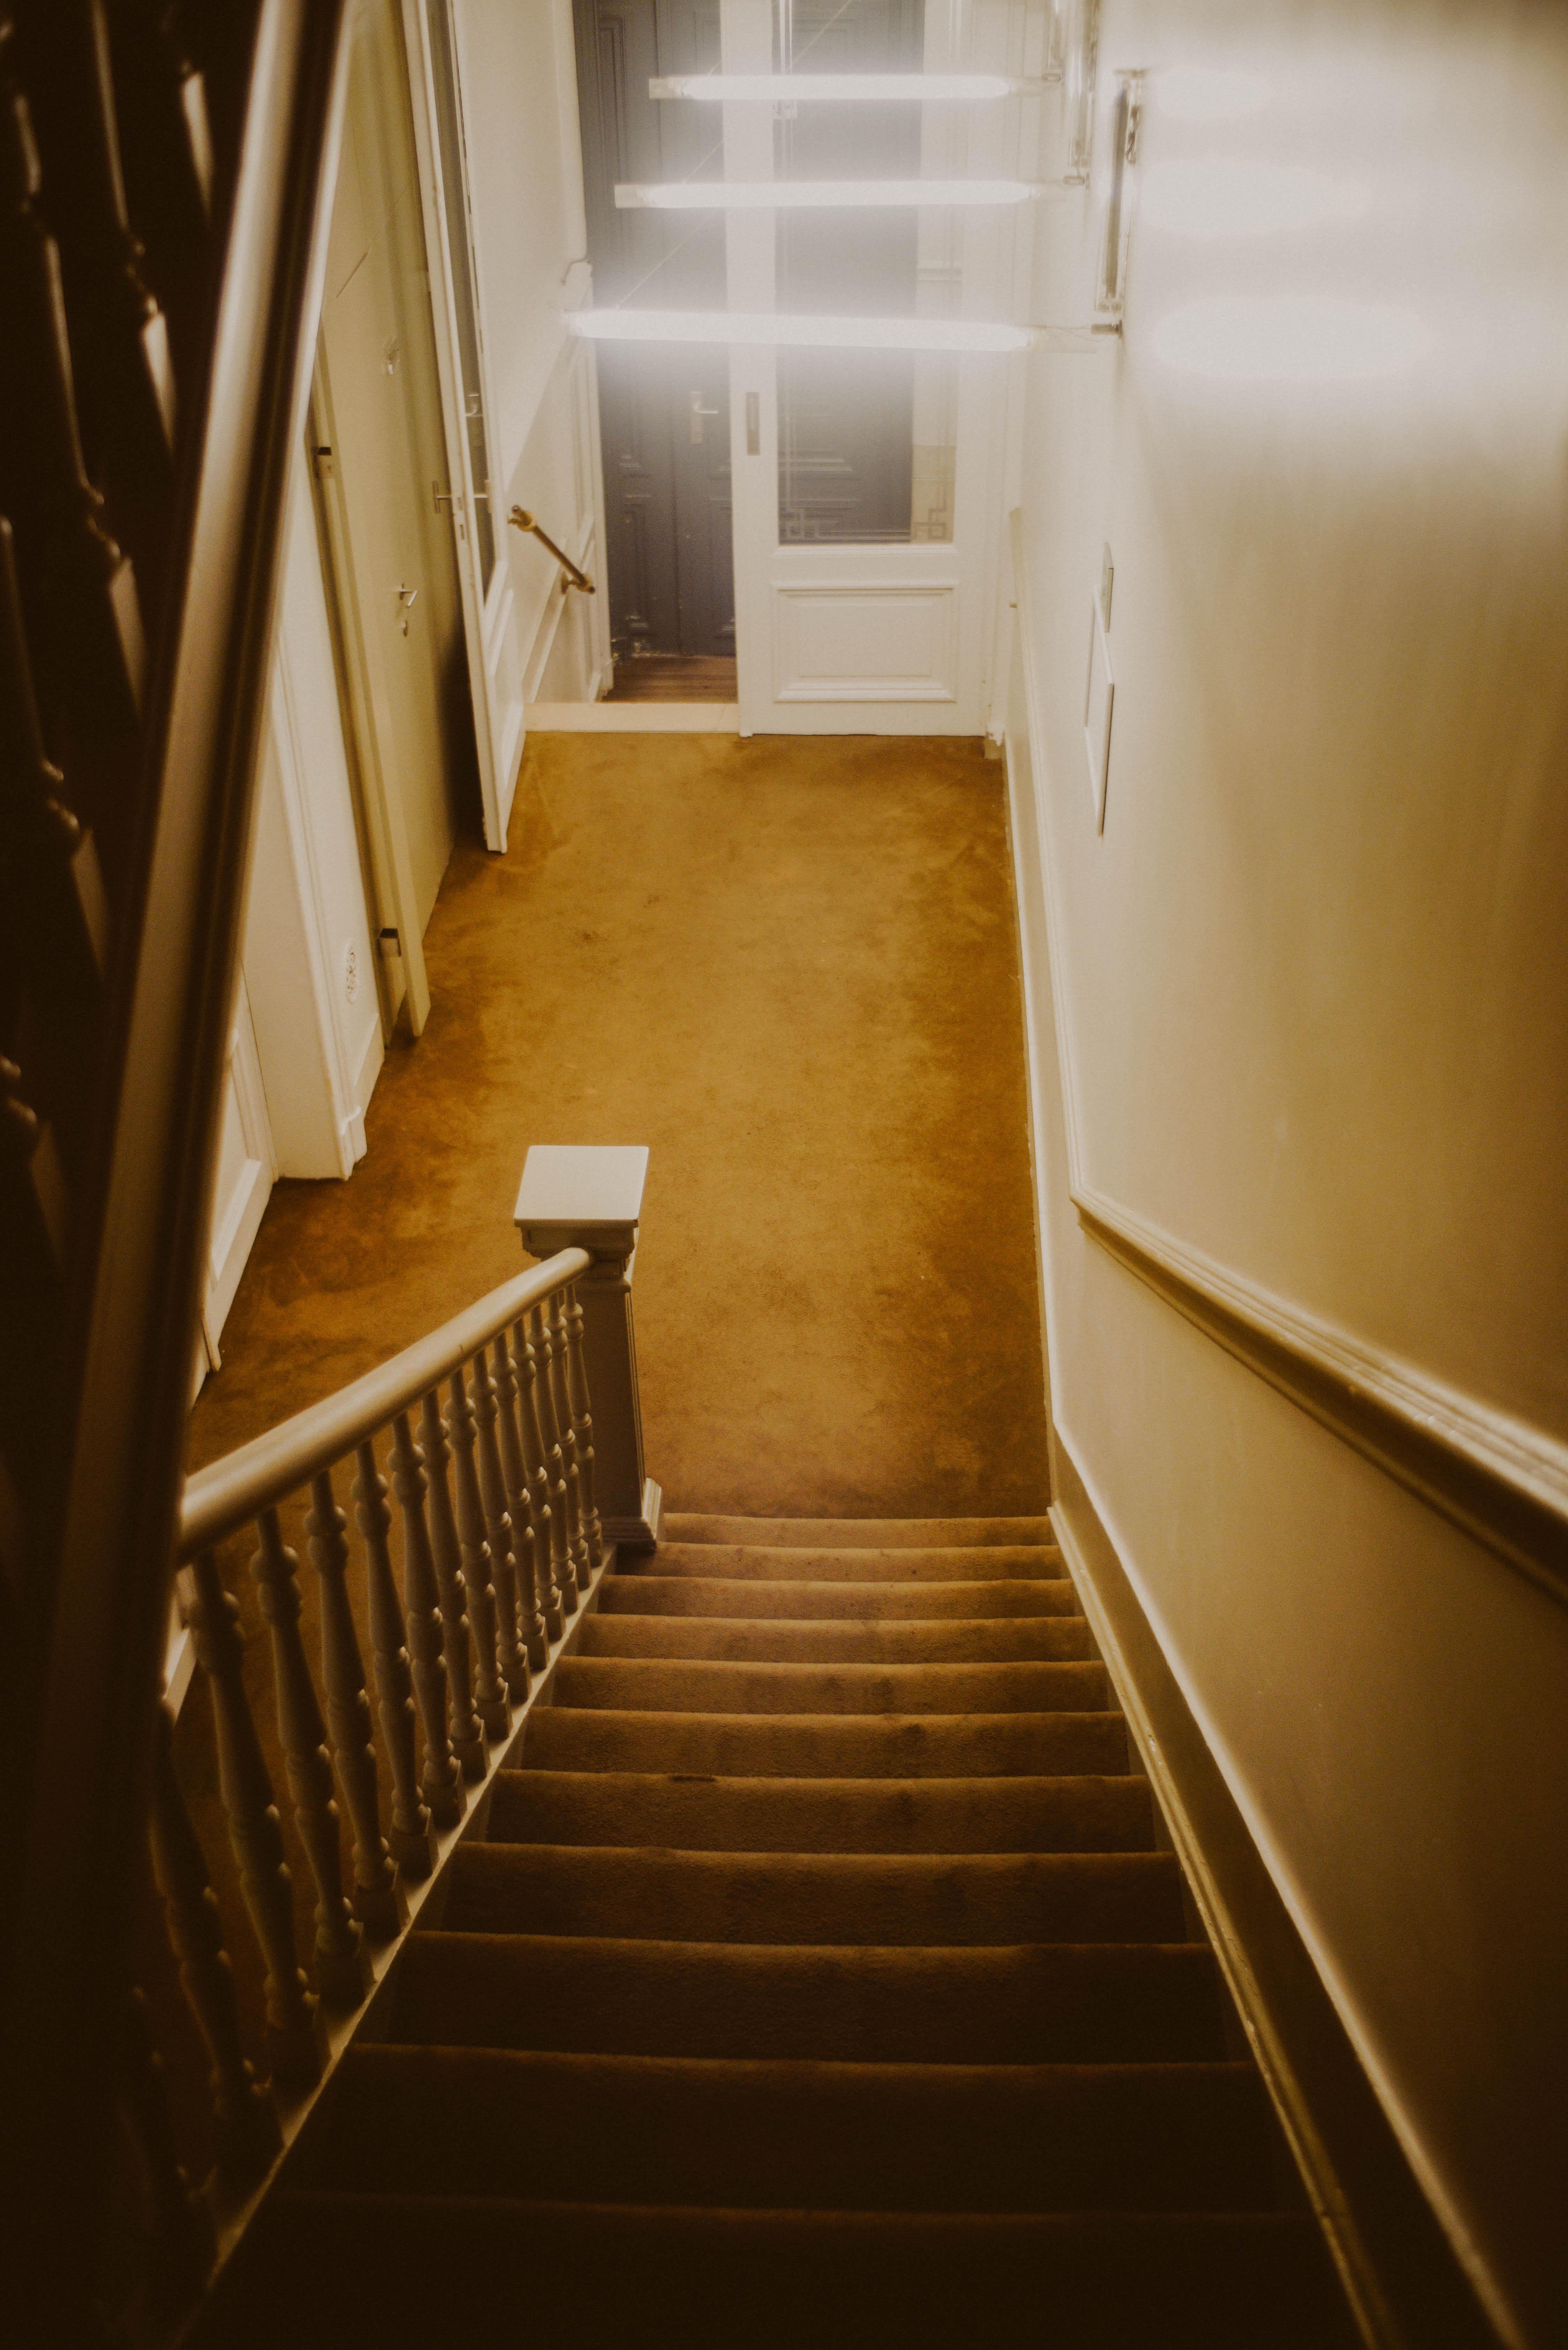 https://get.pxhere.com/photo/architecture-wood-house-floor-interior-hall-room-tourism-interior-design-brussel-colour-art-brussels-design-stairs-hotel-kunst-tourismus-flooring-inneneinrichtung-458931.jpg